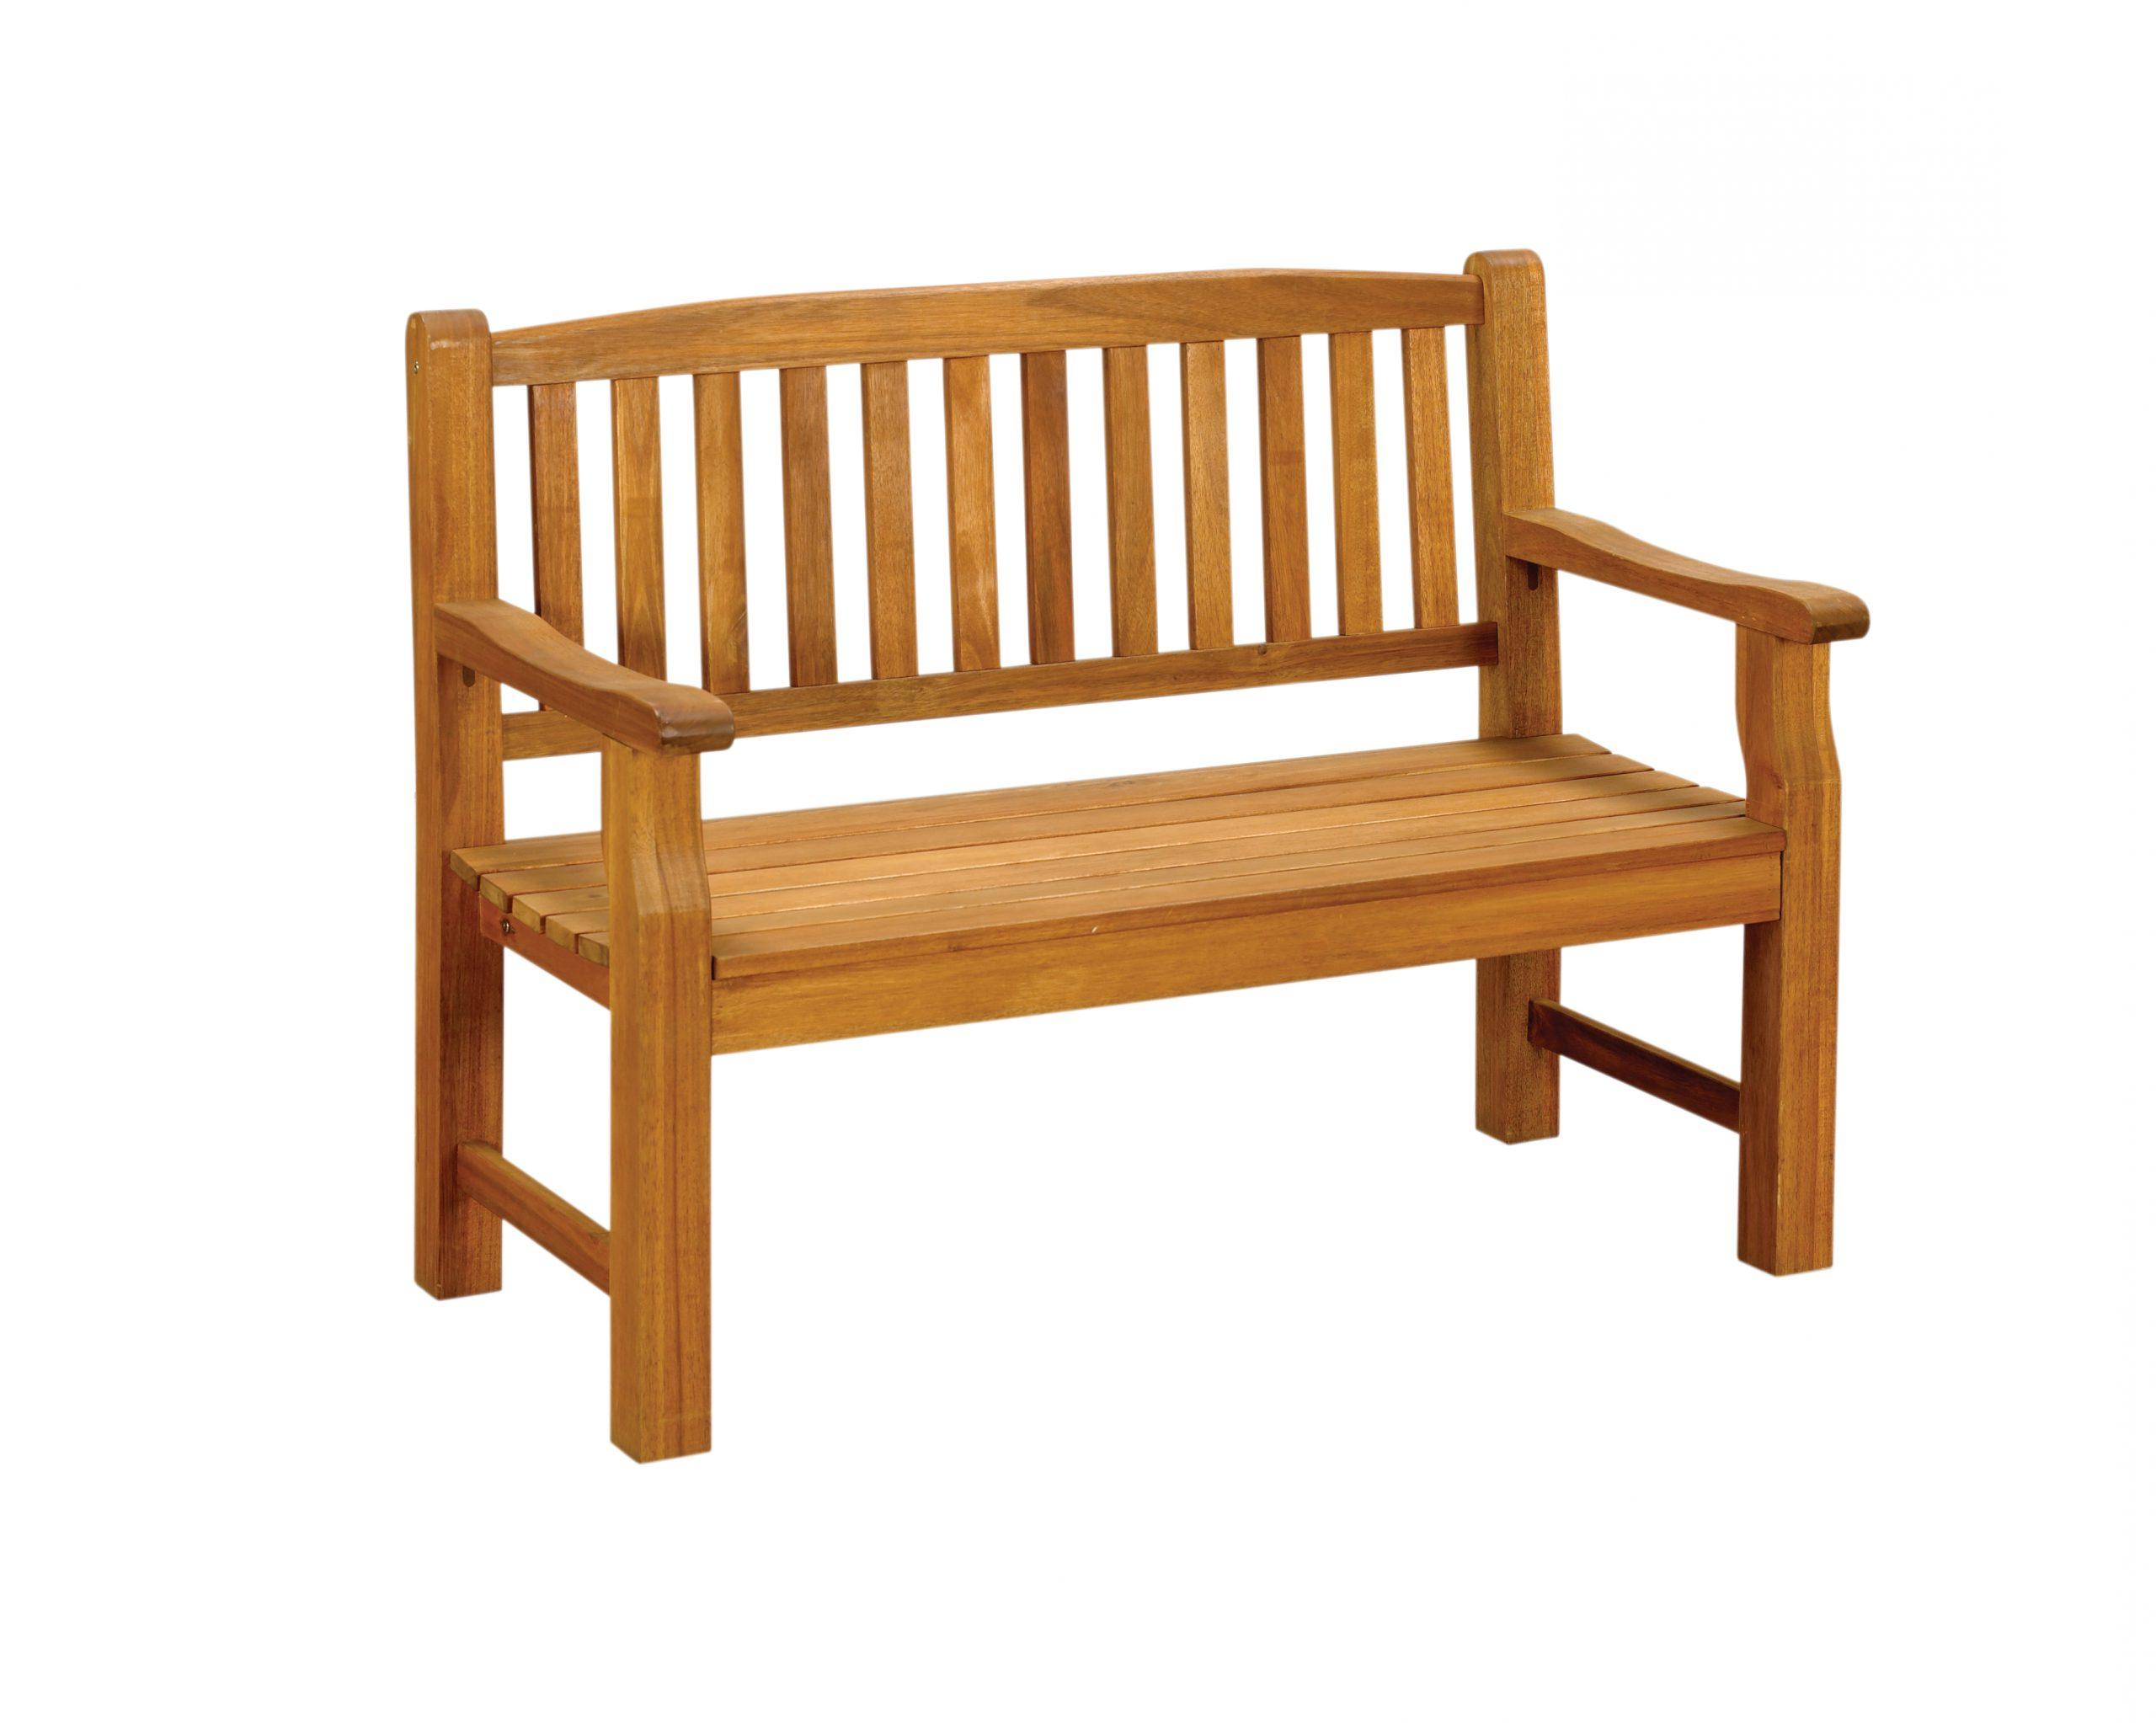 Most Popular Timber Garden Furniture – Laois Sawmills Ltd In Avoca Wood Garden Benches (View 18 of 30)